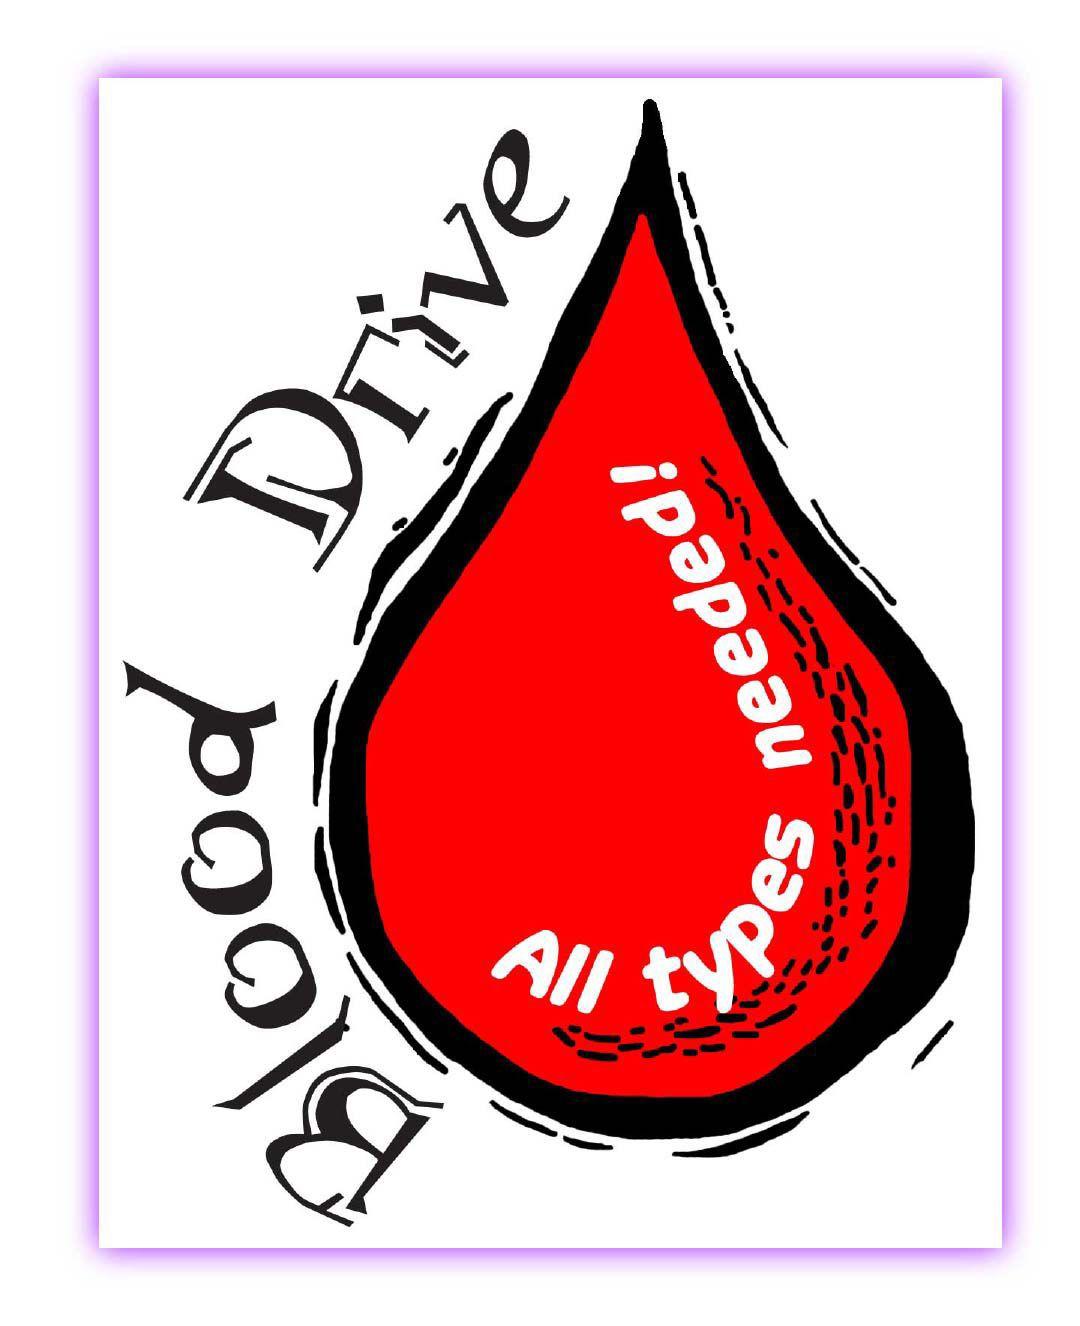 Chamber Blood Drive set for Thursday